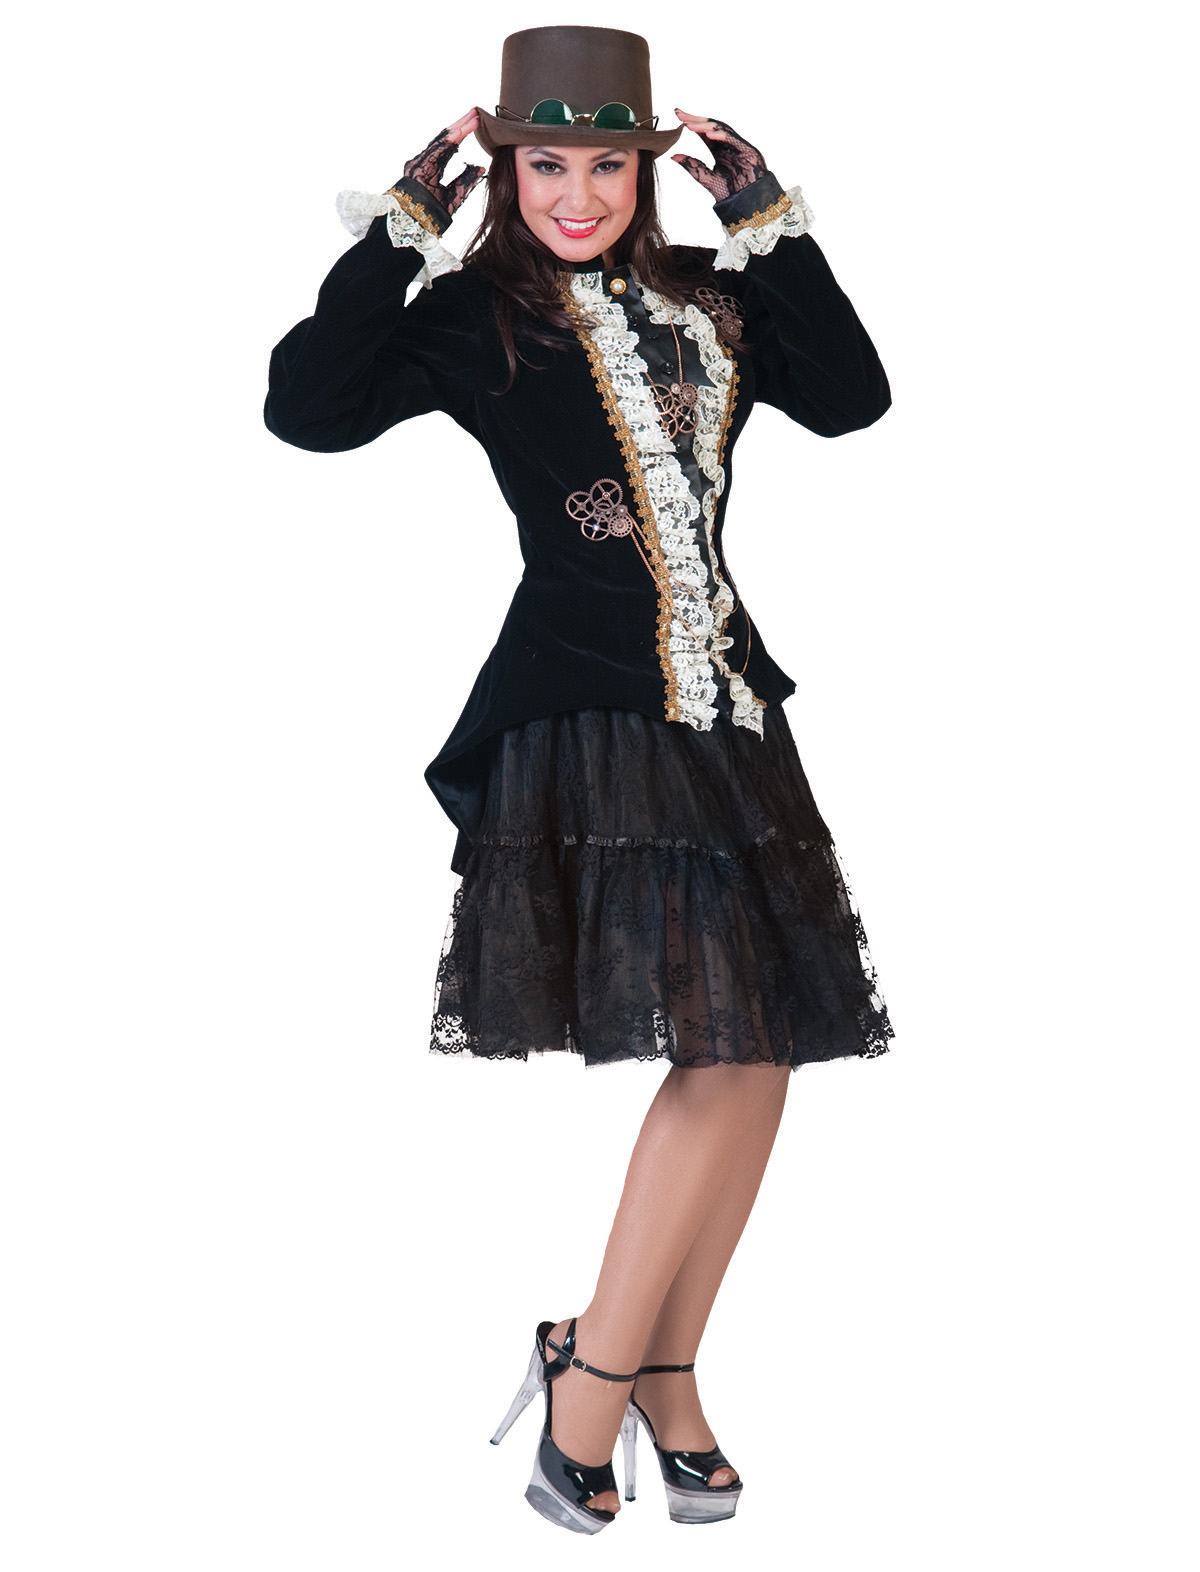 Jacke Steampunk Zoe schwarz/rot schwarz-weiß